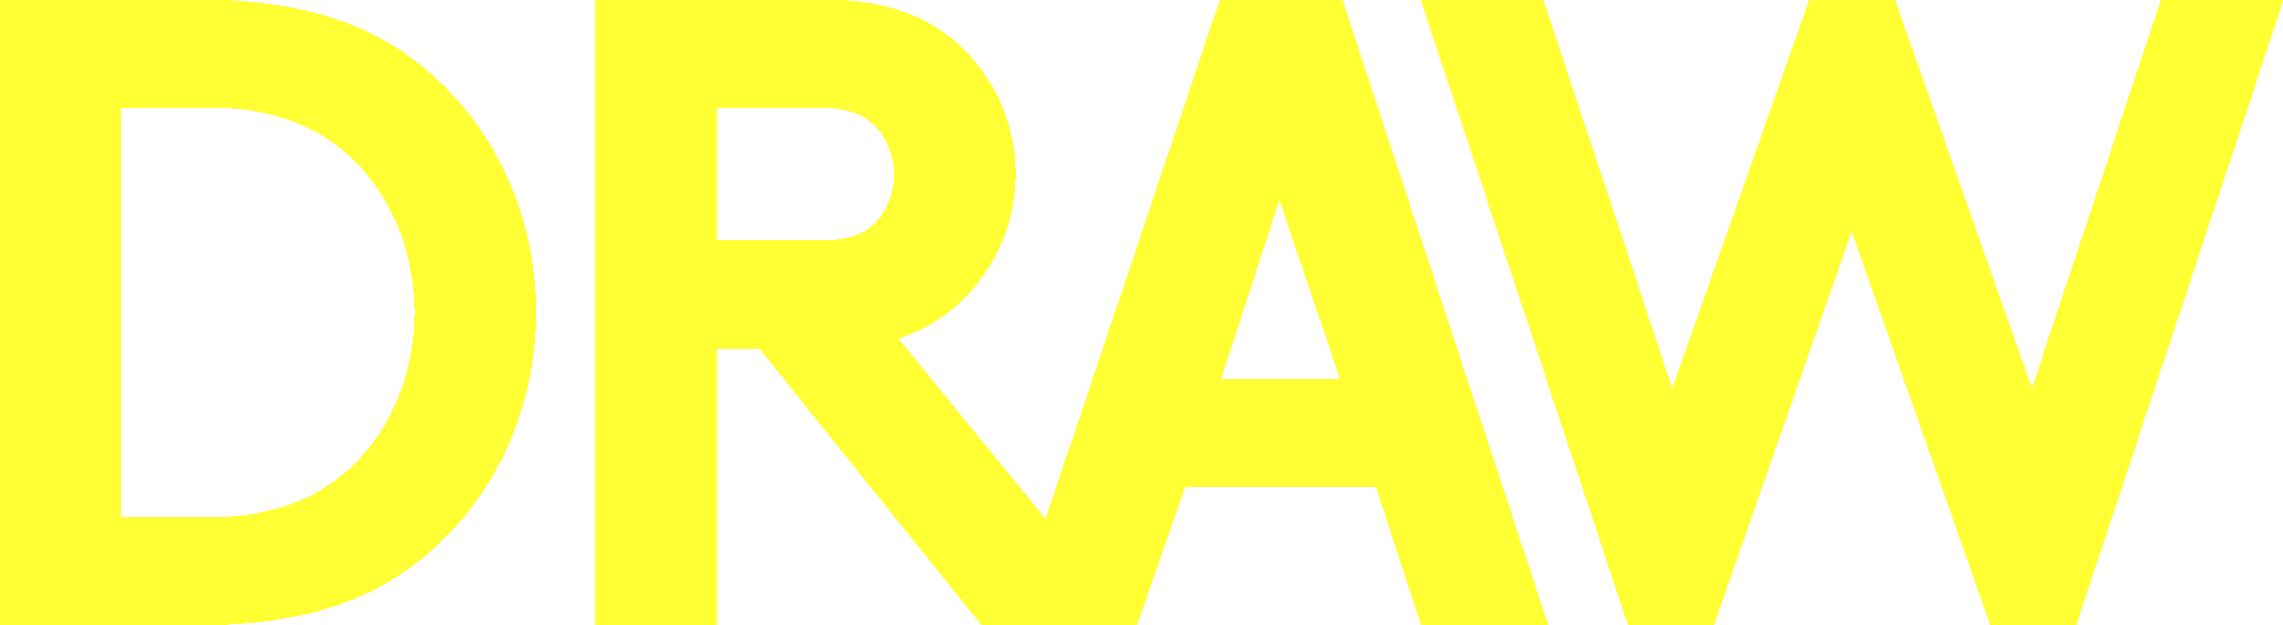 draw-logo-yellow-01.png